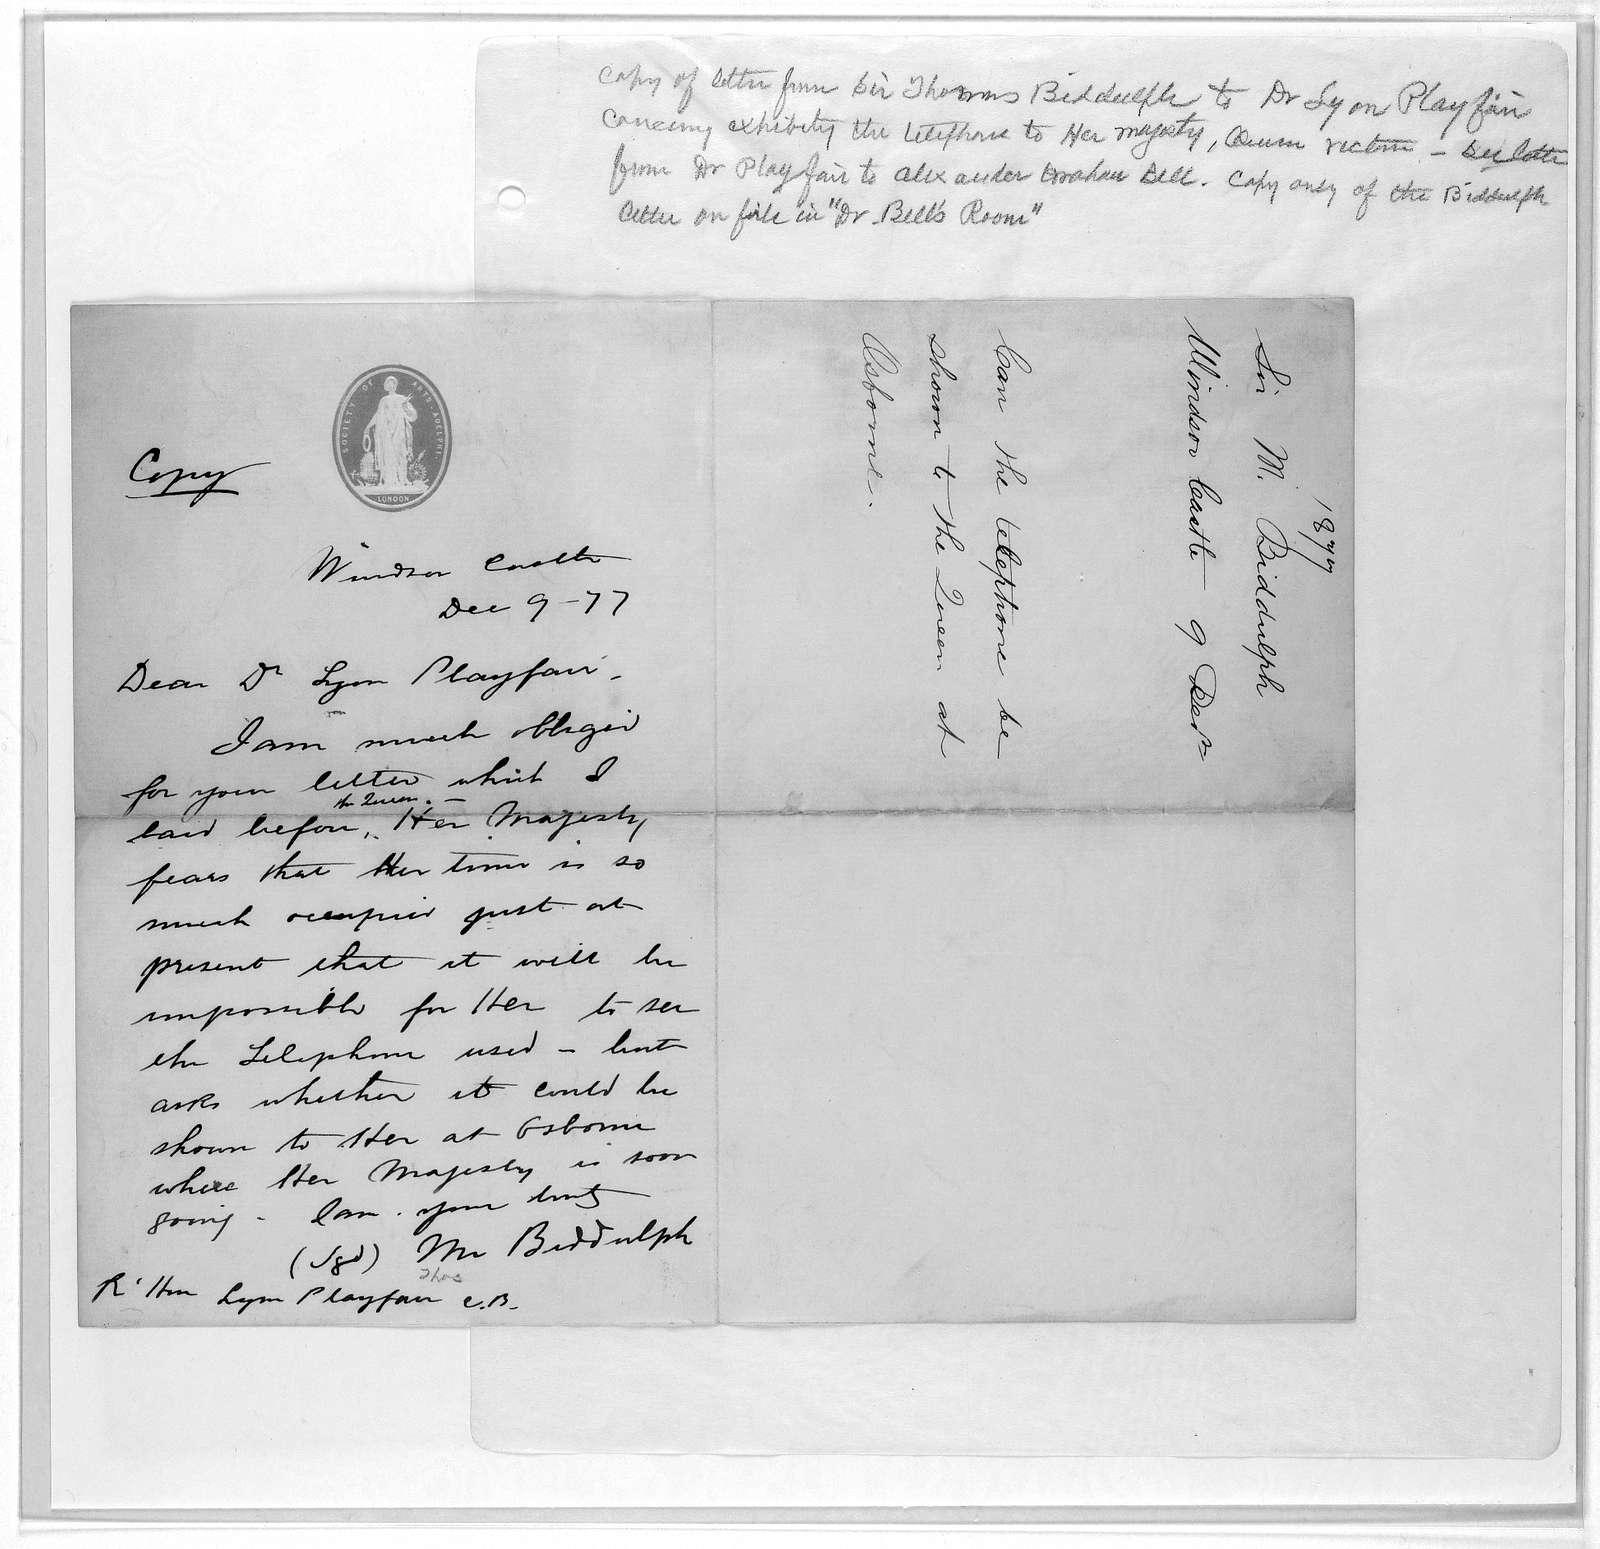 Letter from Thomas Biddulph to Lyon Playfair, December 9, 1877